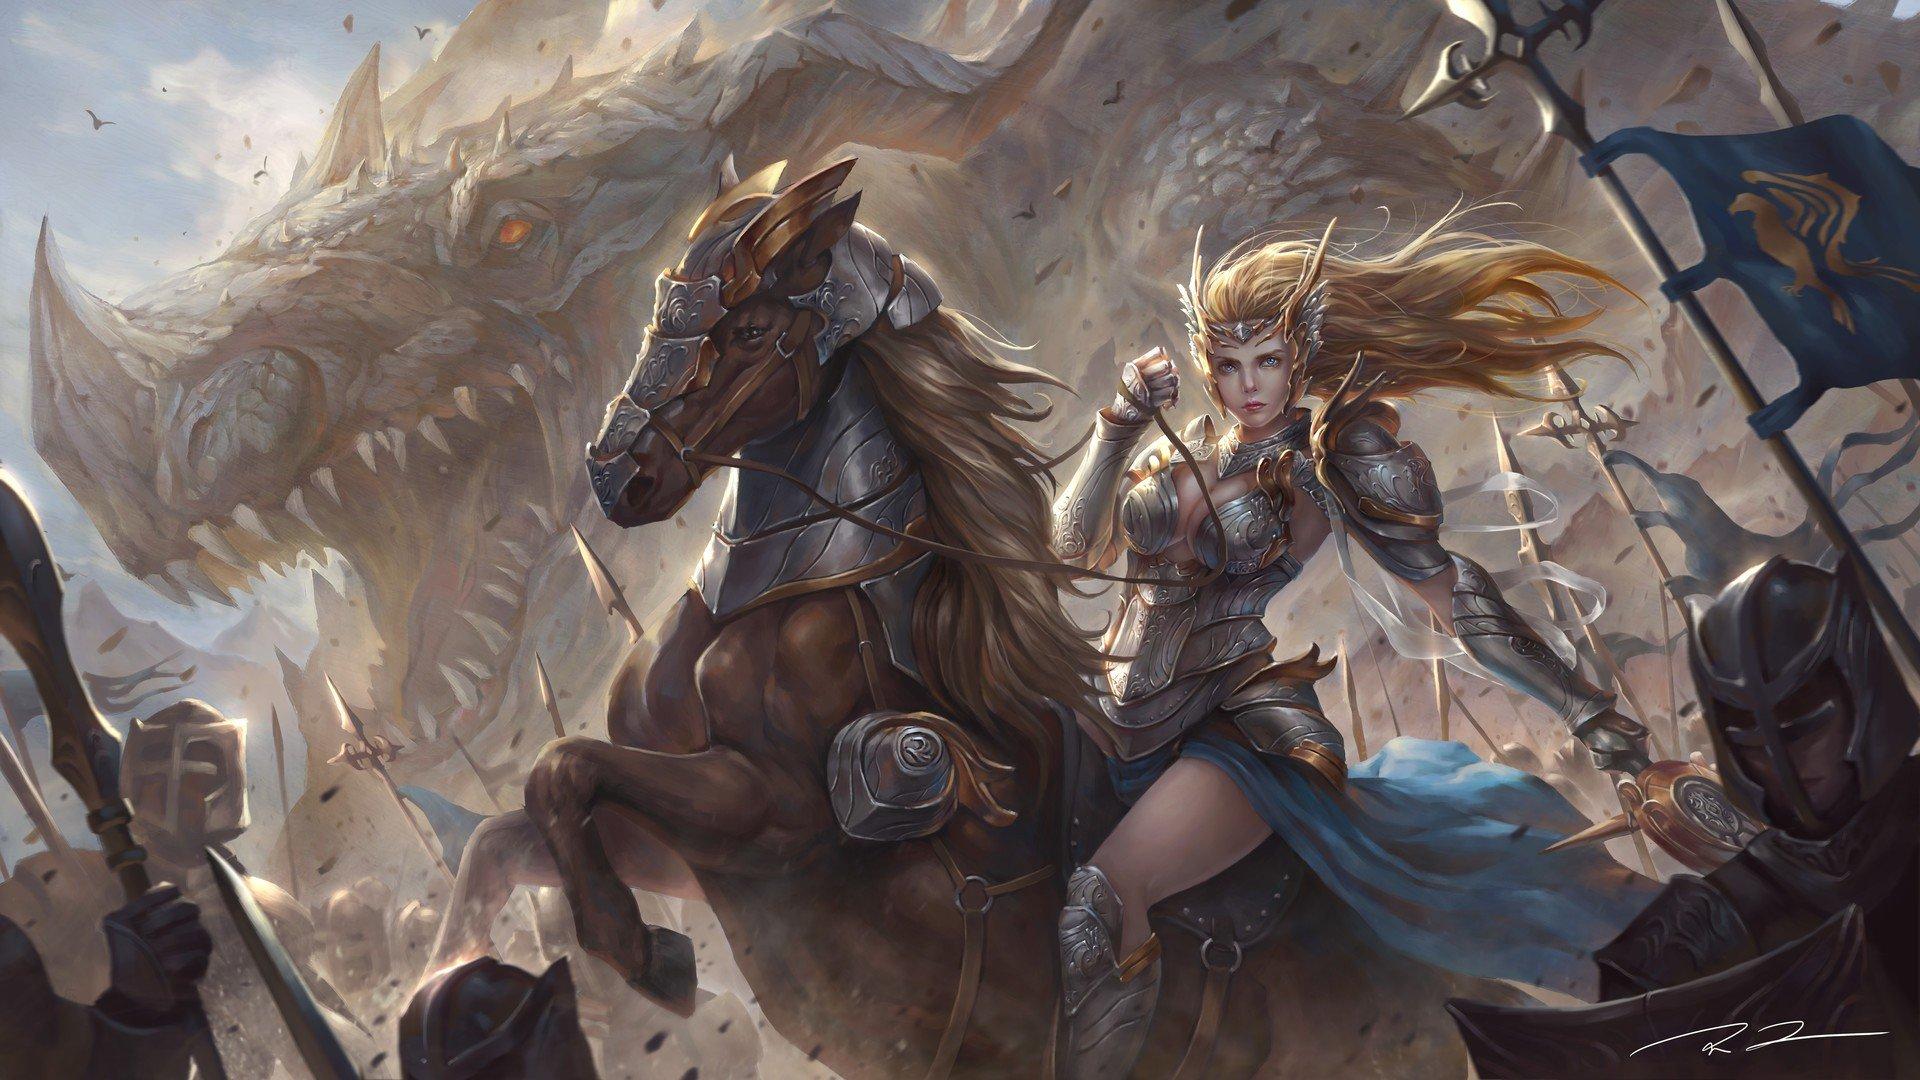 Anime Girl Katana Wallpaper Warrior Fantasy Art Dragon Army Hd Wallpapers Desktop